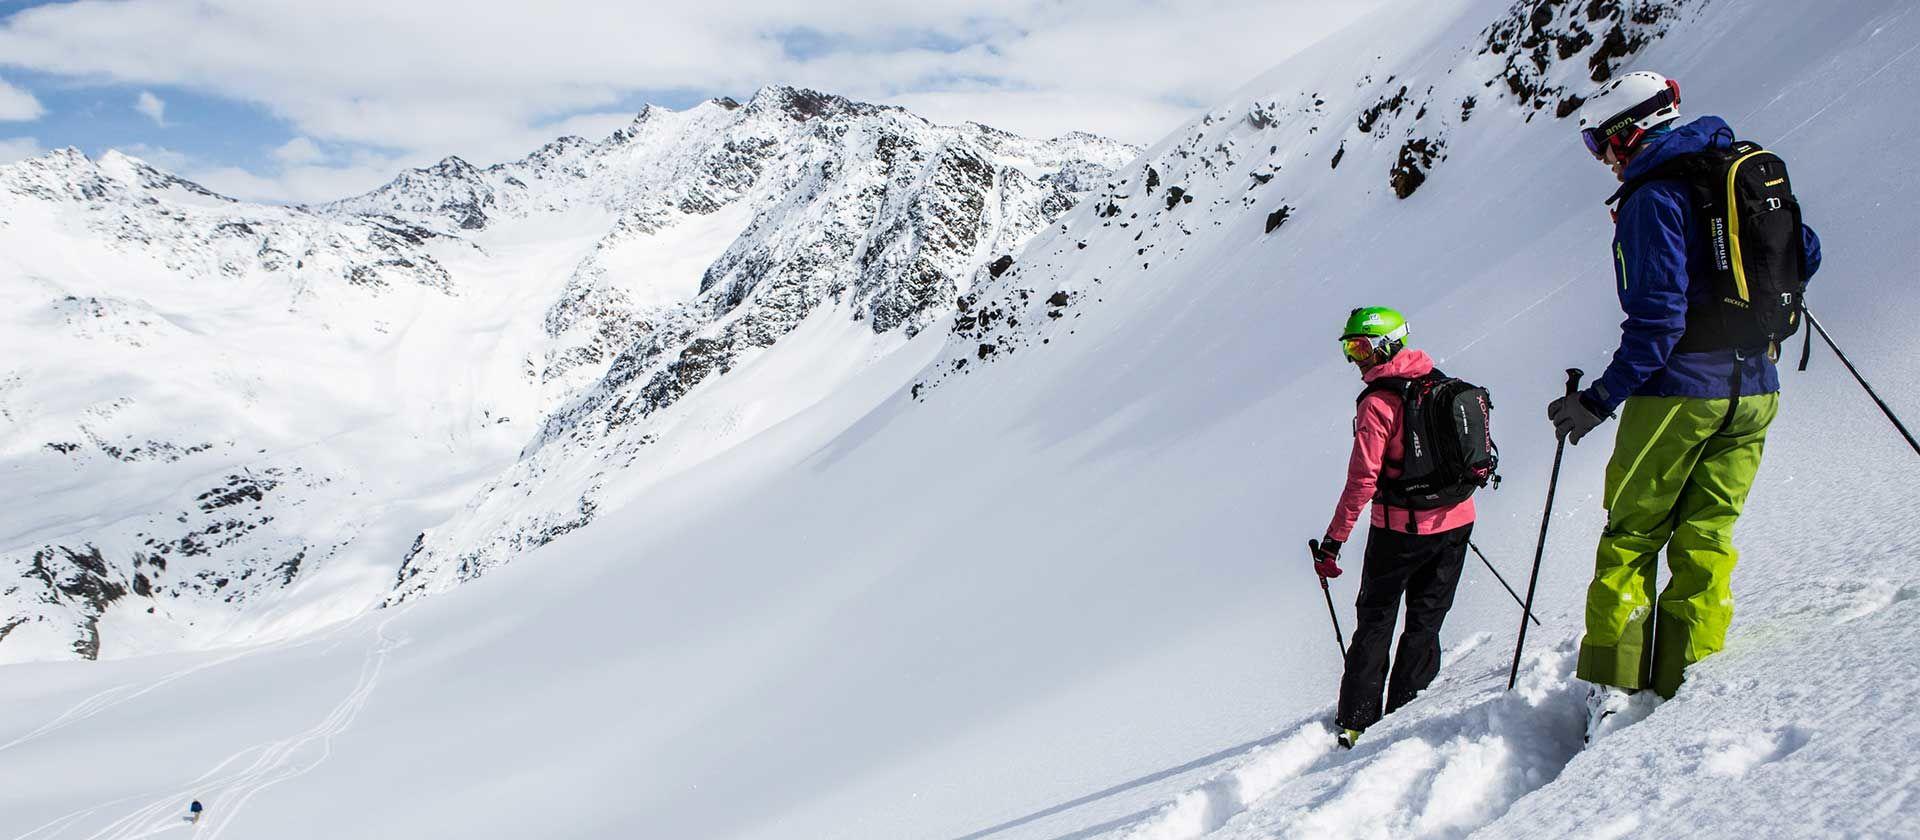 Skifahren im Kaunertal- Foto Kaunertaler Gletscher Daniel Zangerl